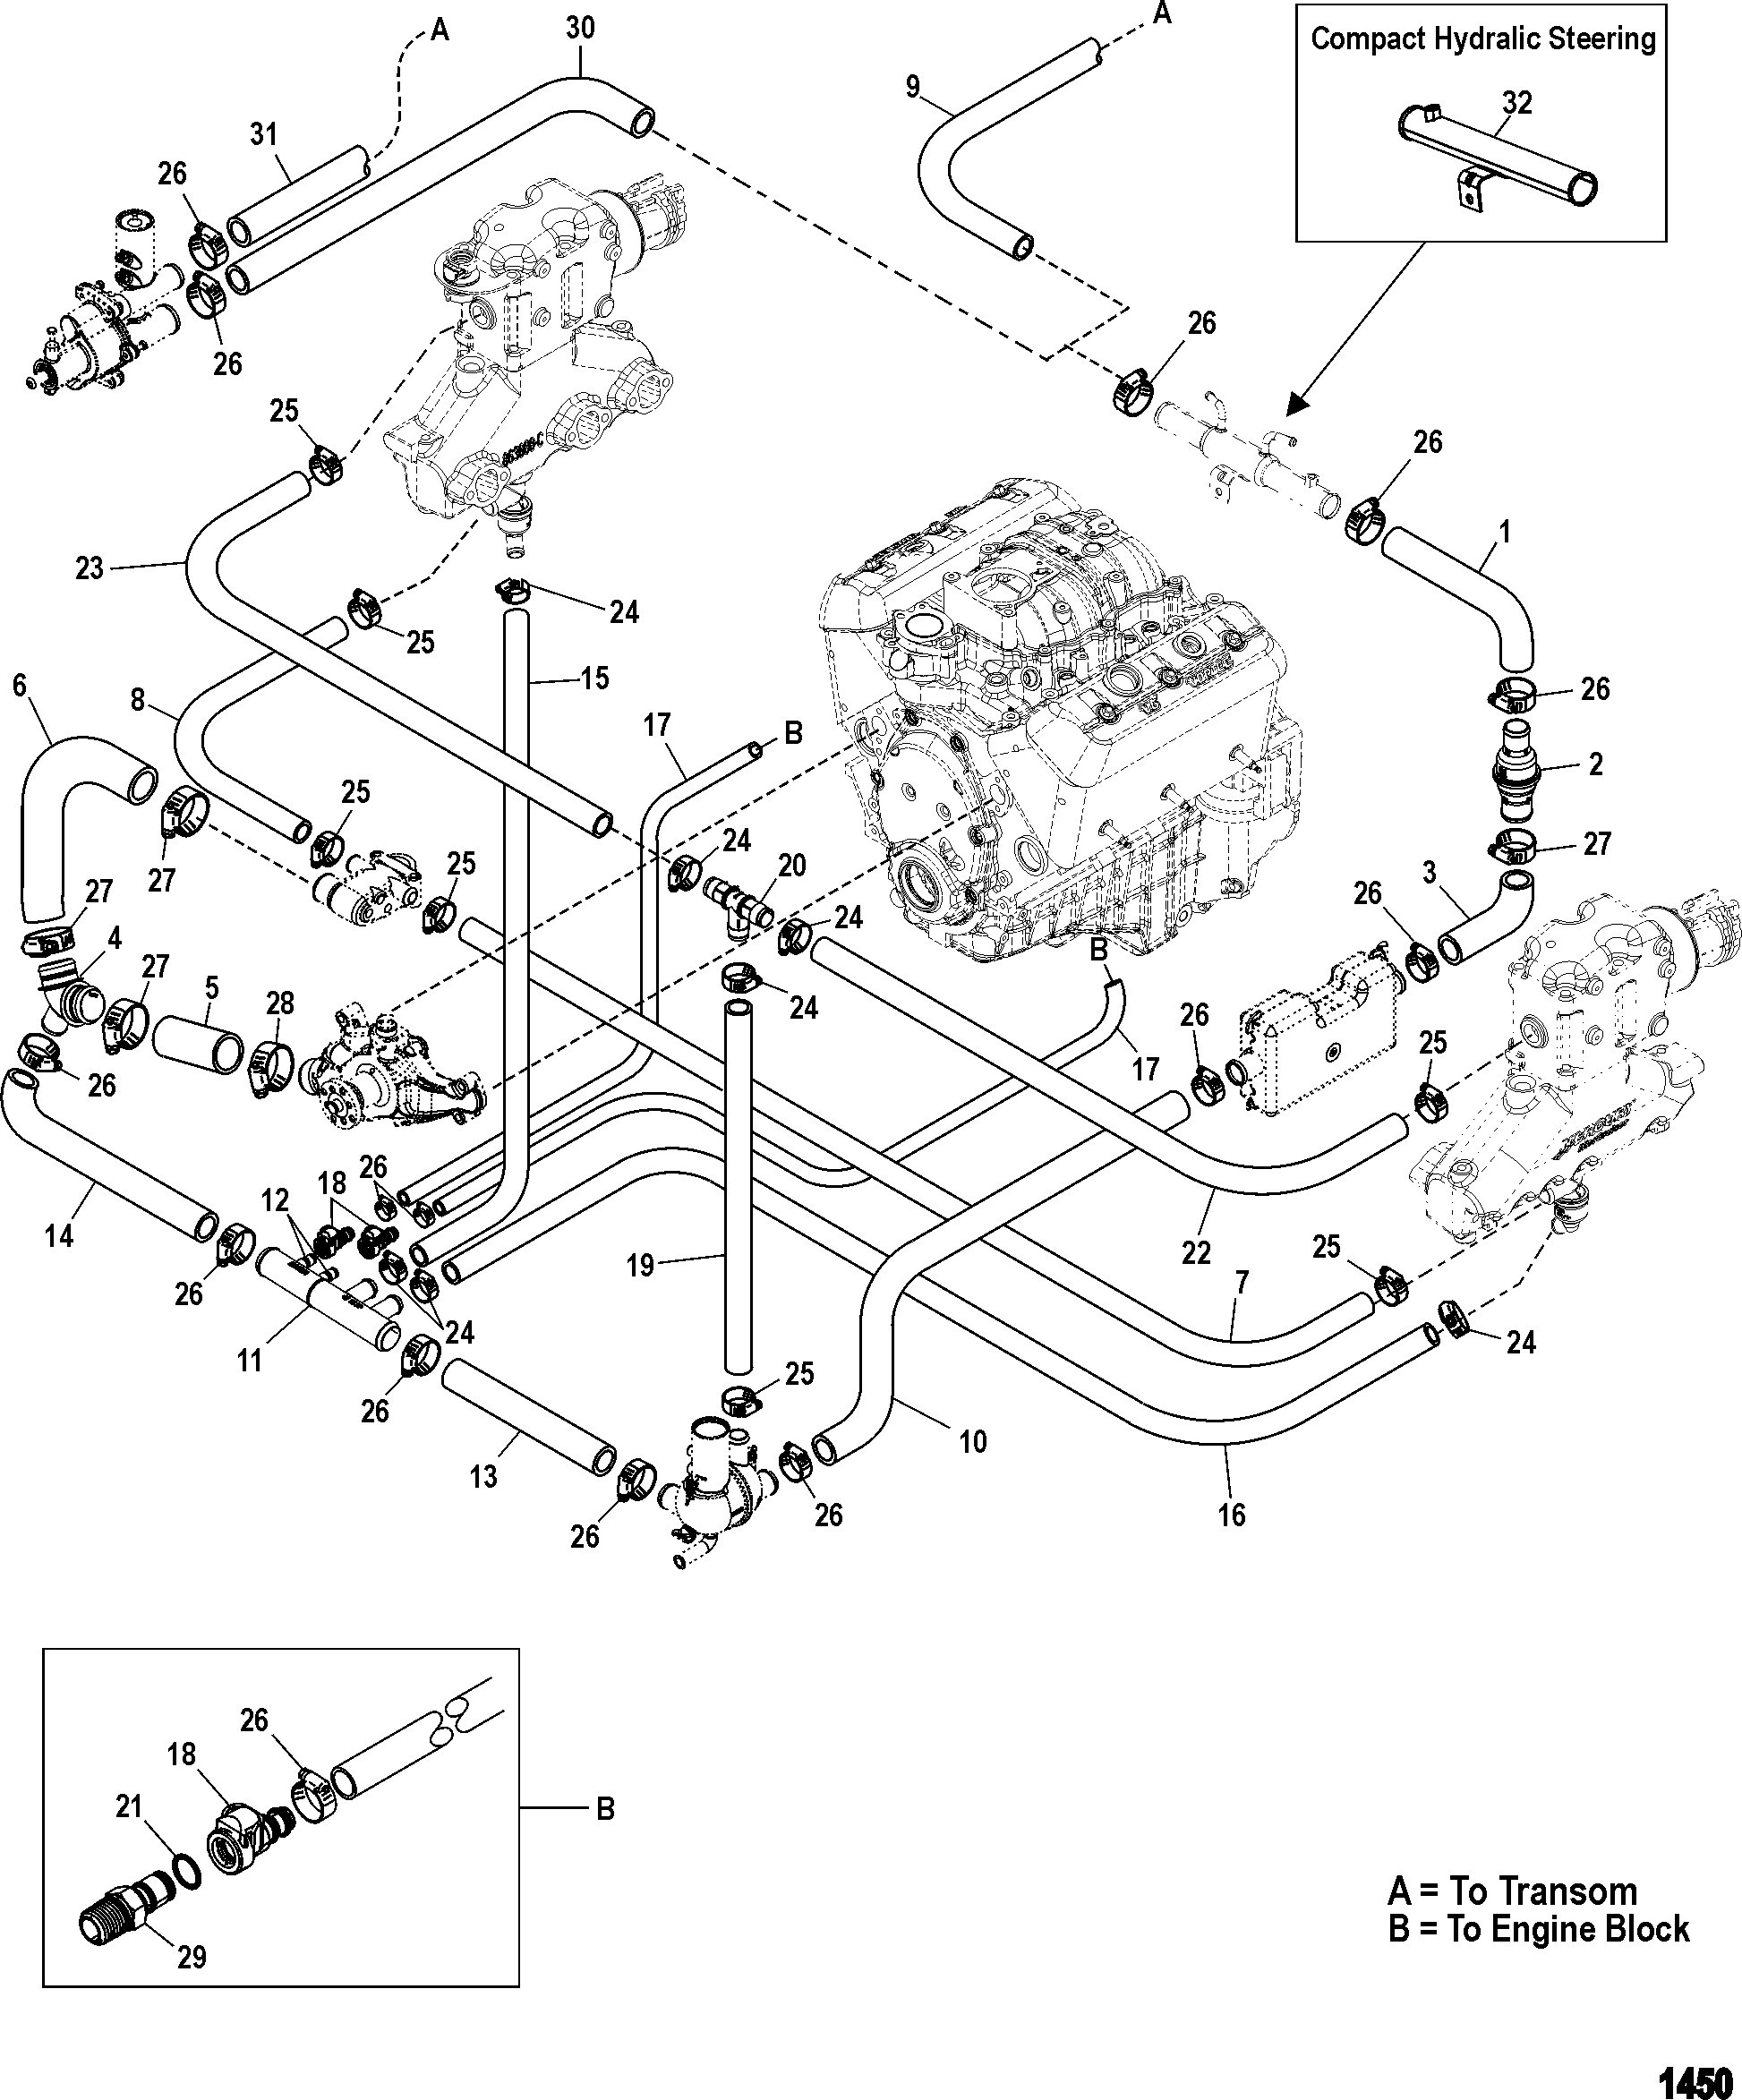 BR_1430] Silverado 4 3 Engine Diagram Free DiagramJebrp Faun Attr Benkeme Mohammedshrine Librar Wiring 101